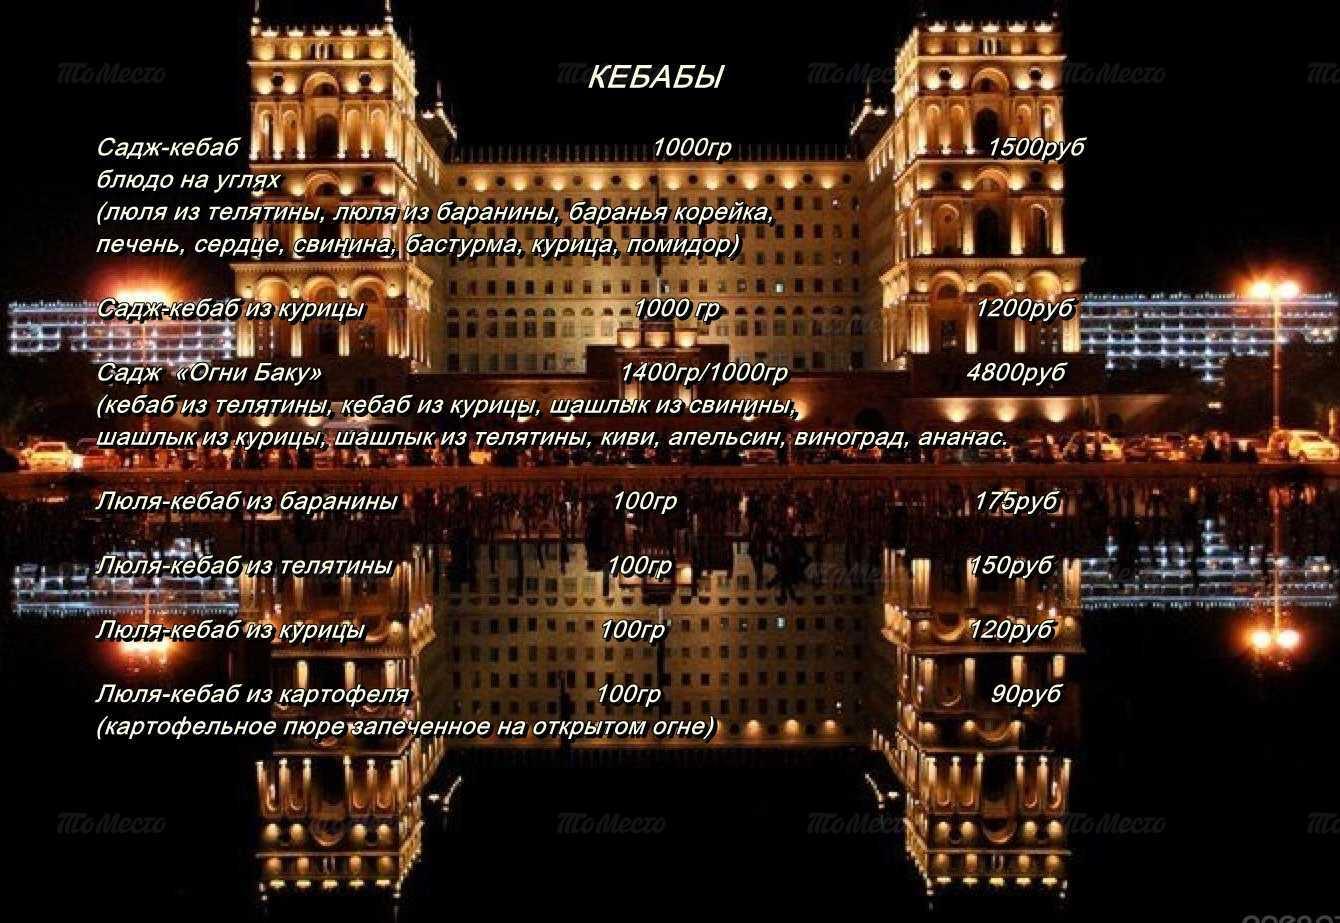 Меню ночного клуба, ресторана Аурум ((бывш. Белый рояль, Панорама)) на улице Куйбышева